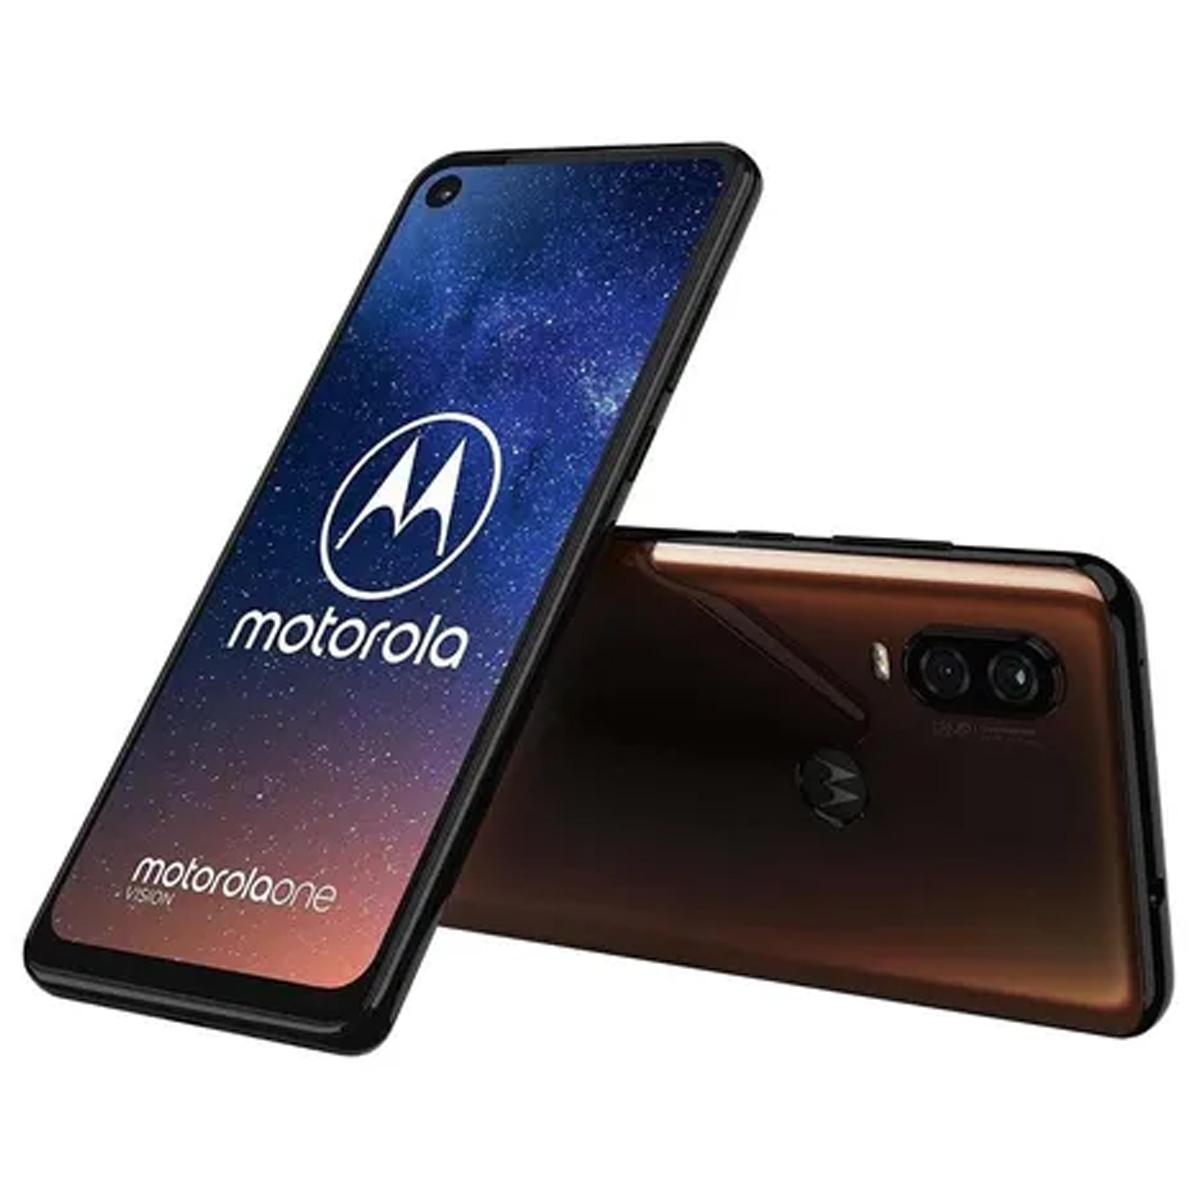 Smartphone Motorola One Vision 128gb 4gb Ram Tela 6.3' Cobre